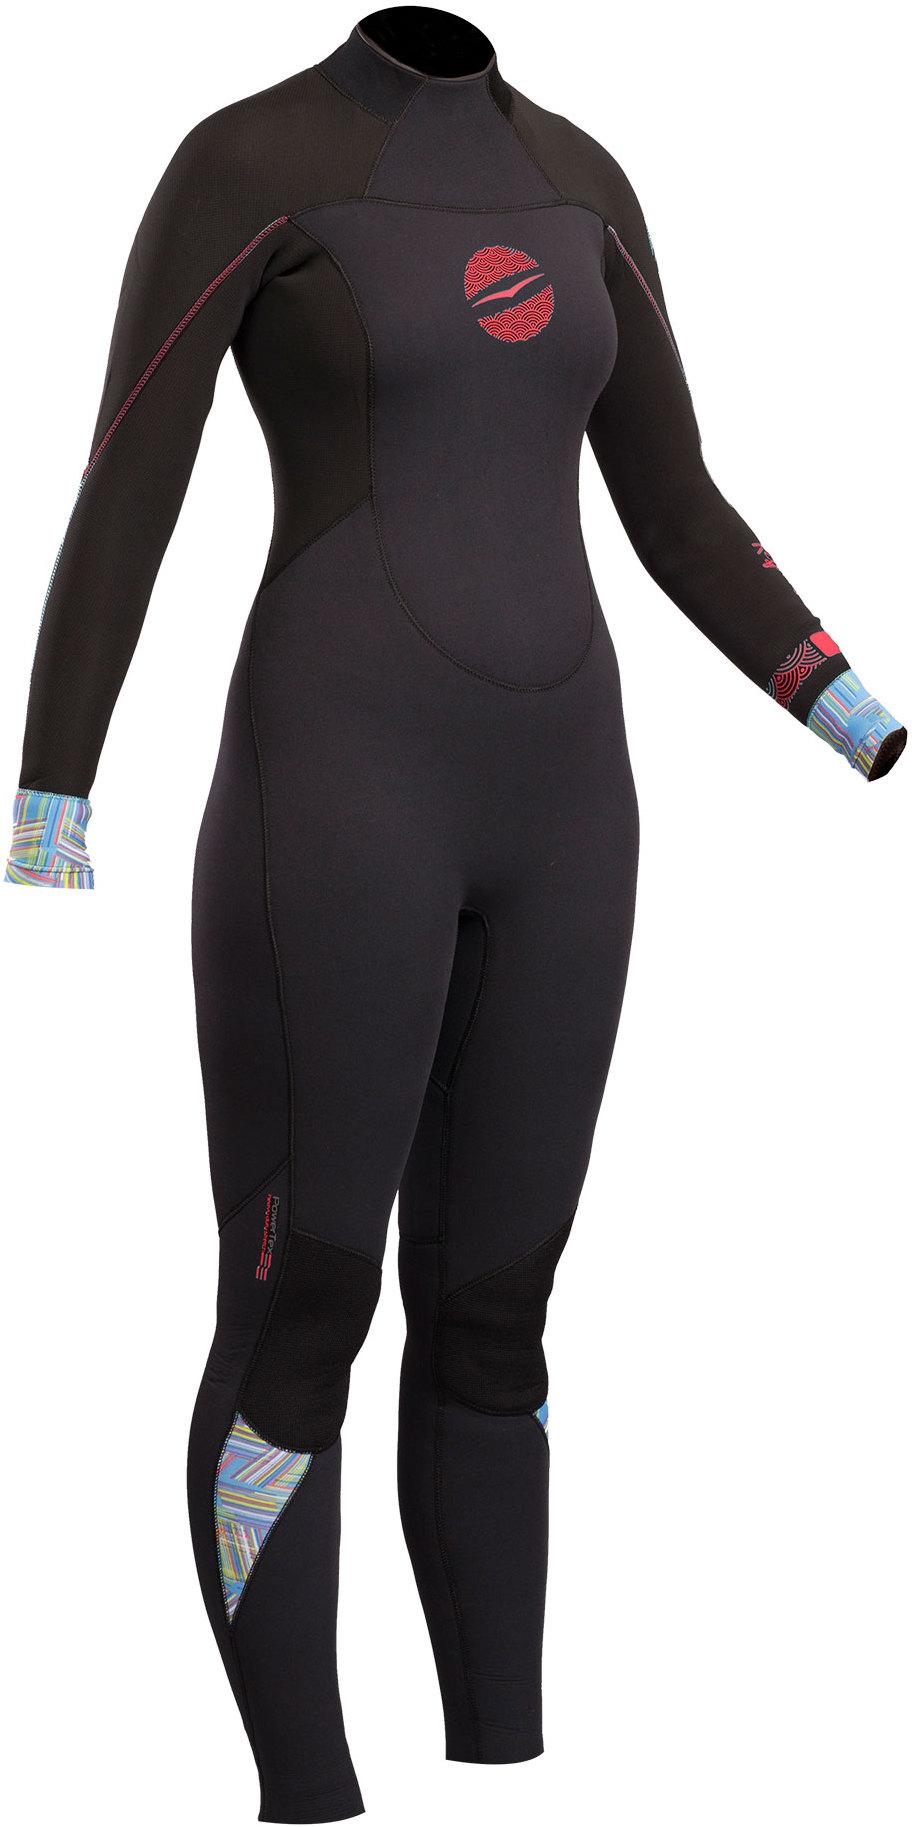 2019 Gul Response Womens 4/3mm GBS Back Zip Wetsuit Black RE1248-B4